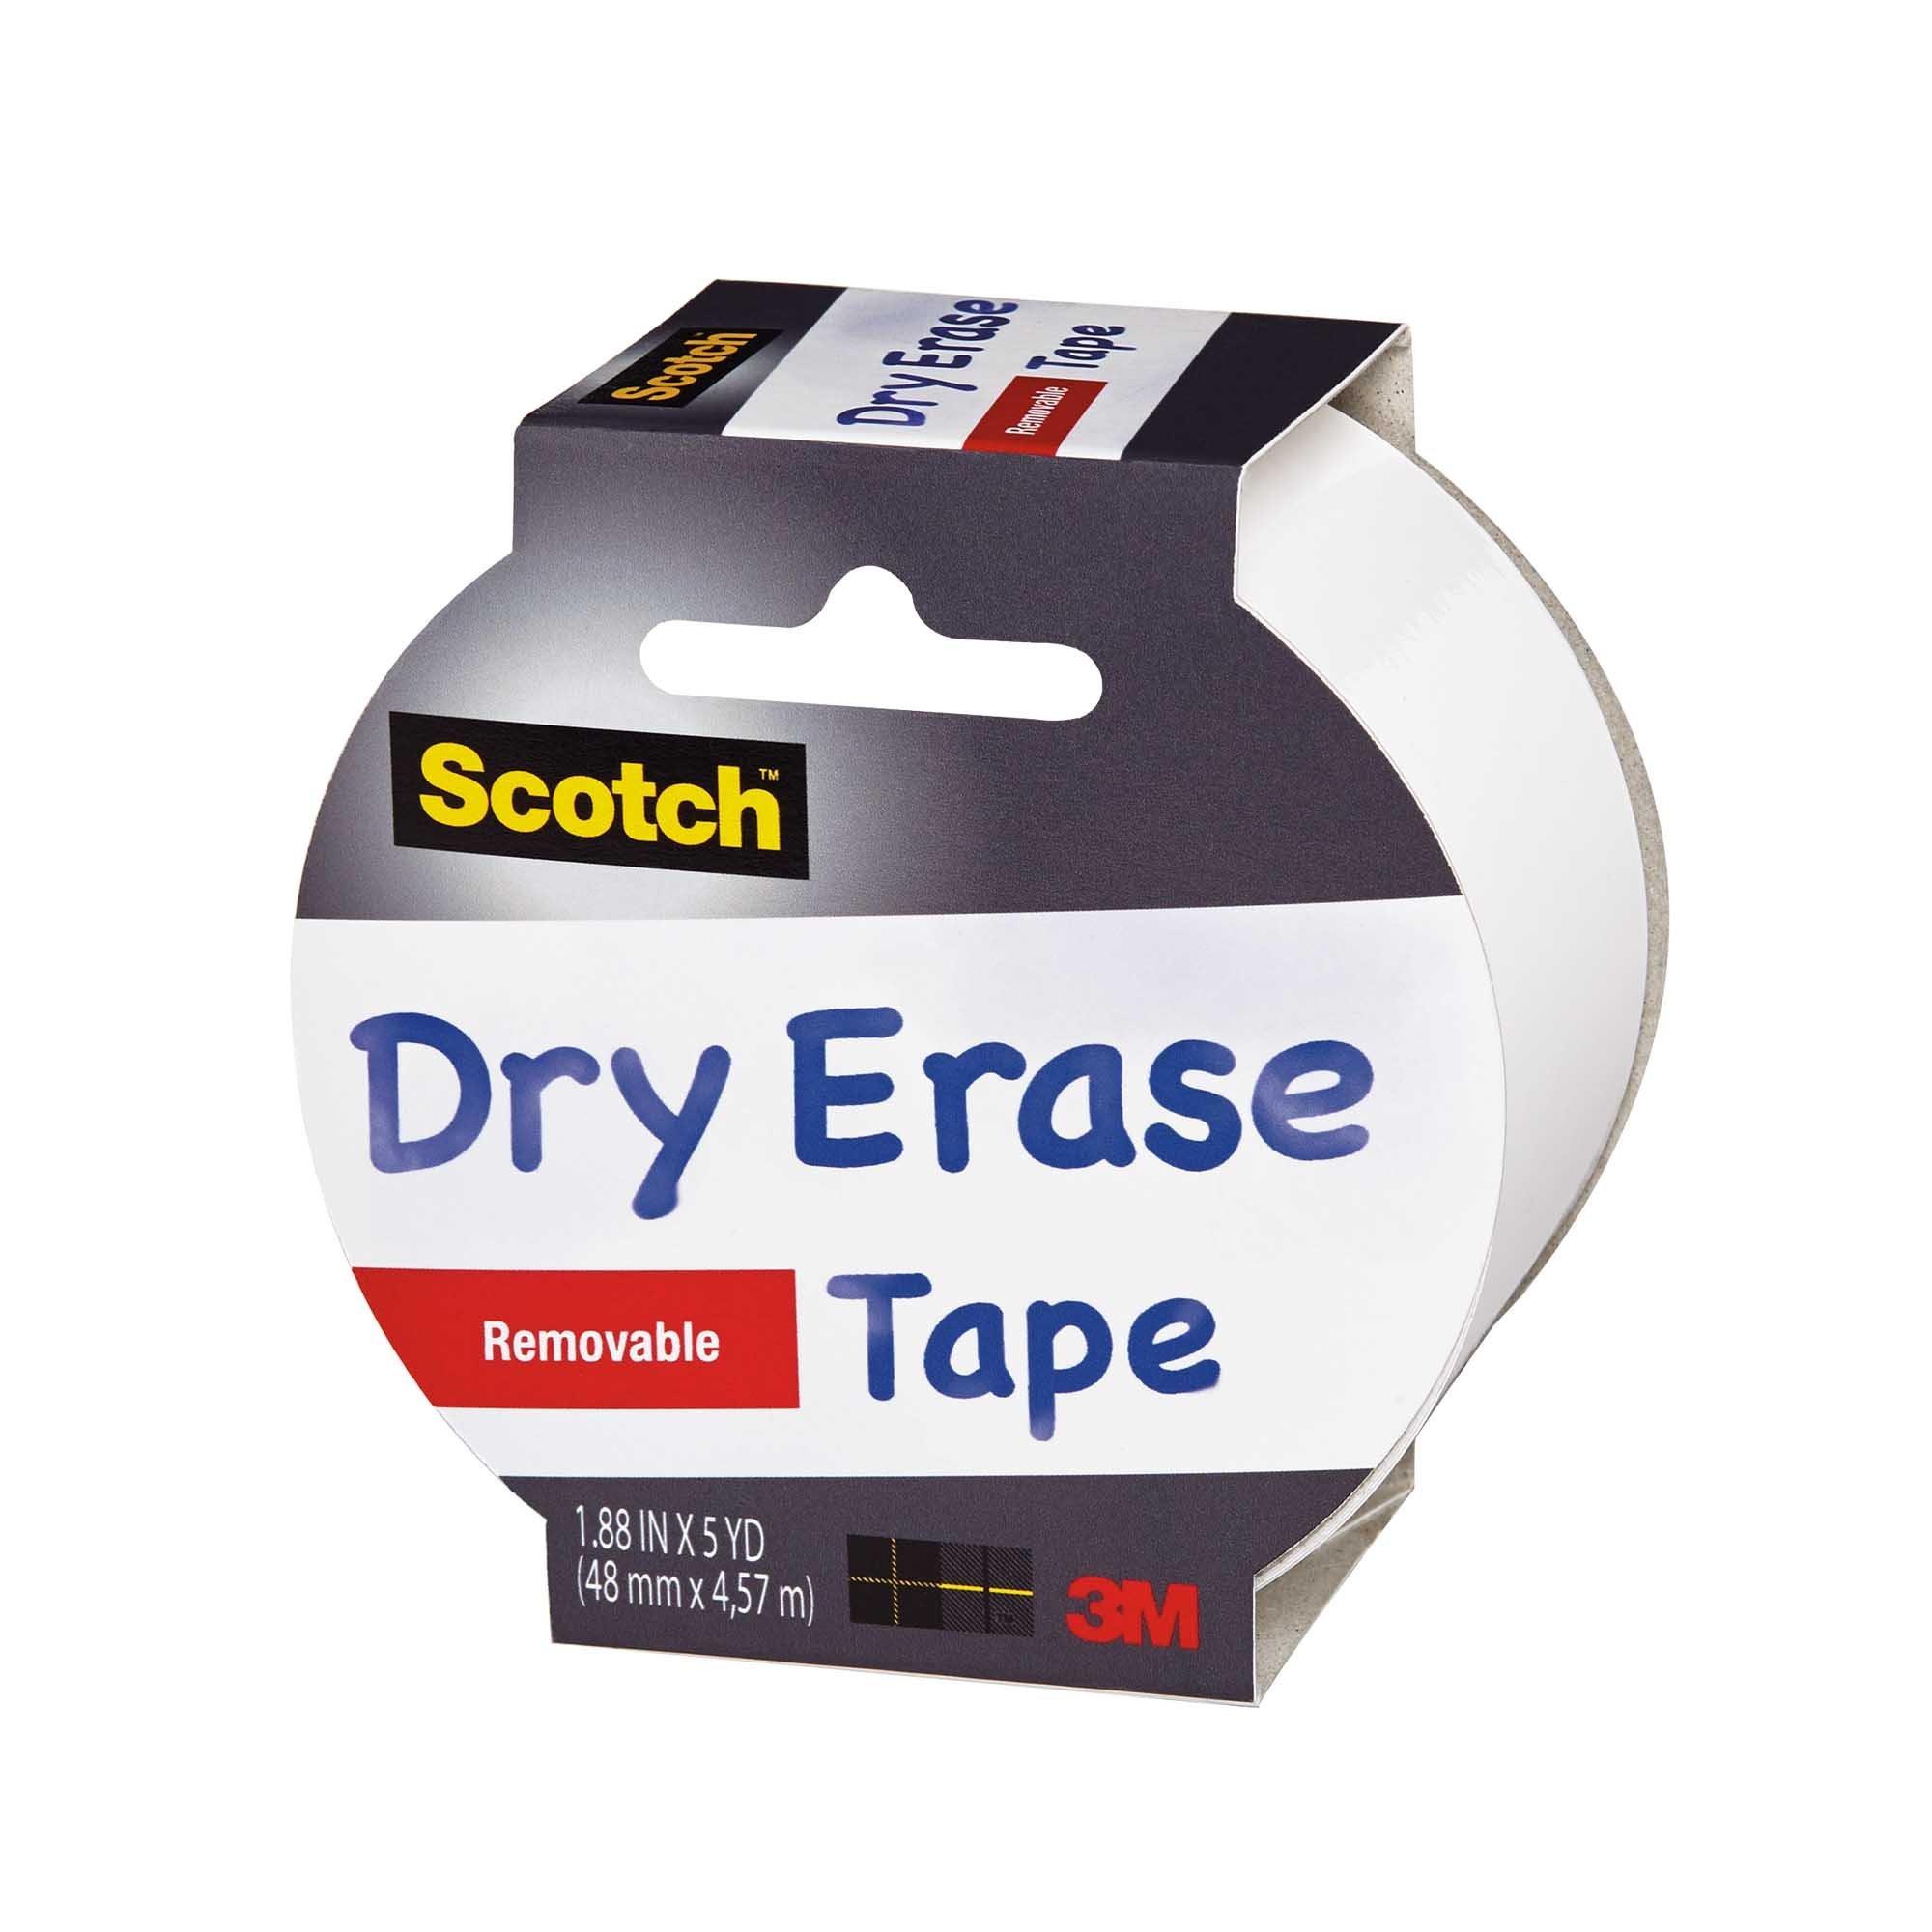 Scotch Chalkboard Tape 1DN2, White 1.88-Inch x 5-Yard, 4-PACK